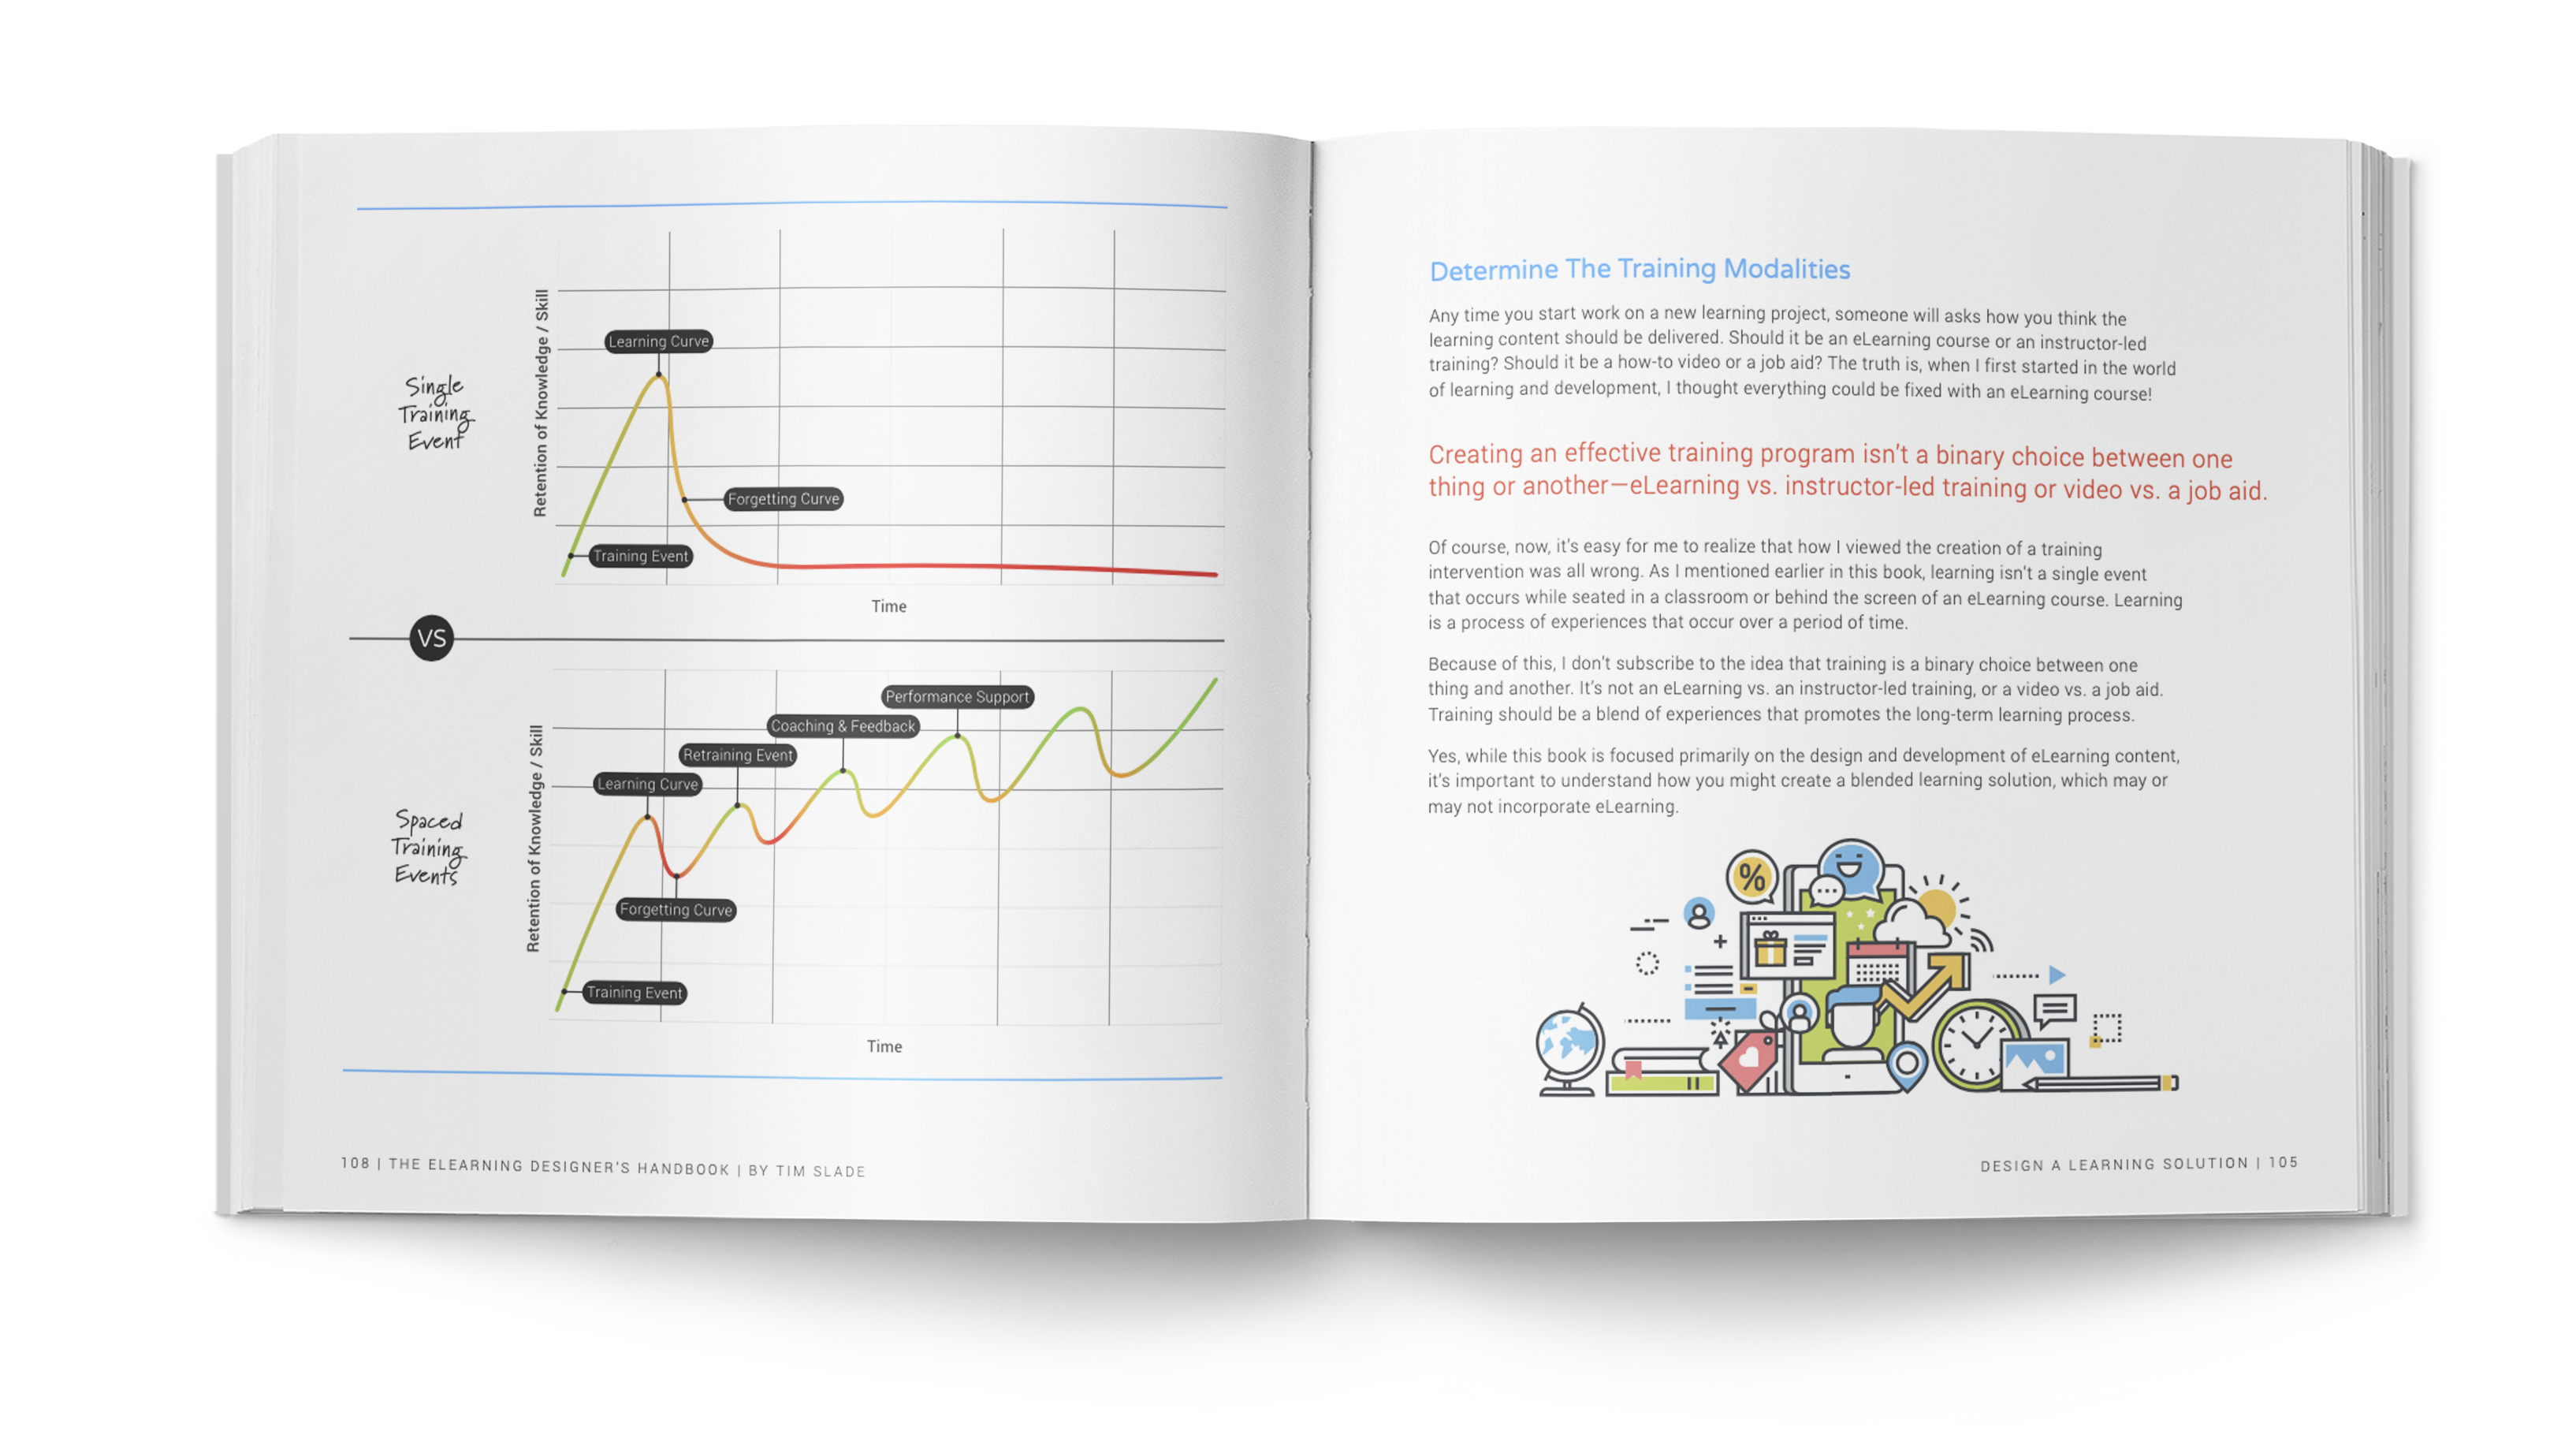 The eLearning Designer's Handbook by Tim Slade   Design a Learning Solution   Freelance eLearning Designer   The eLearning Designer's Academy